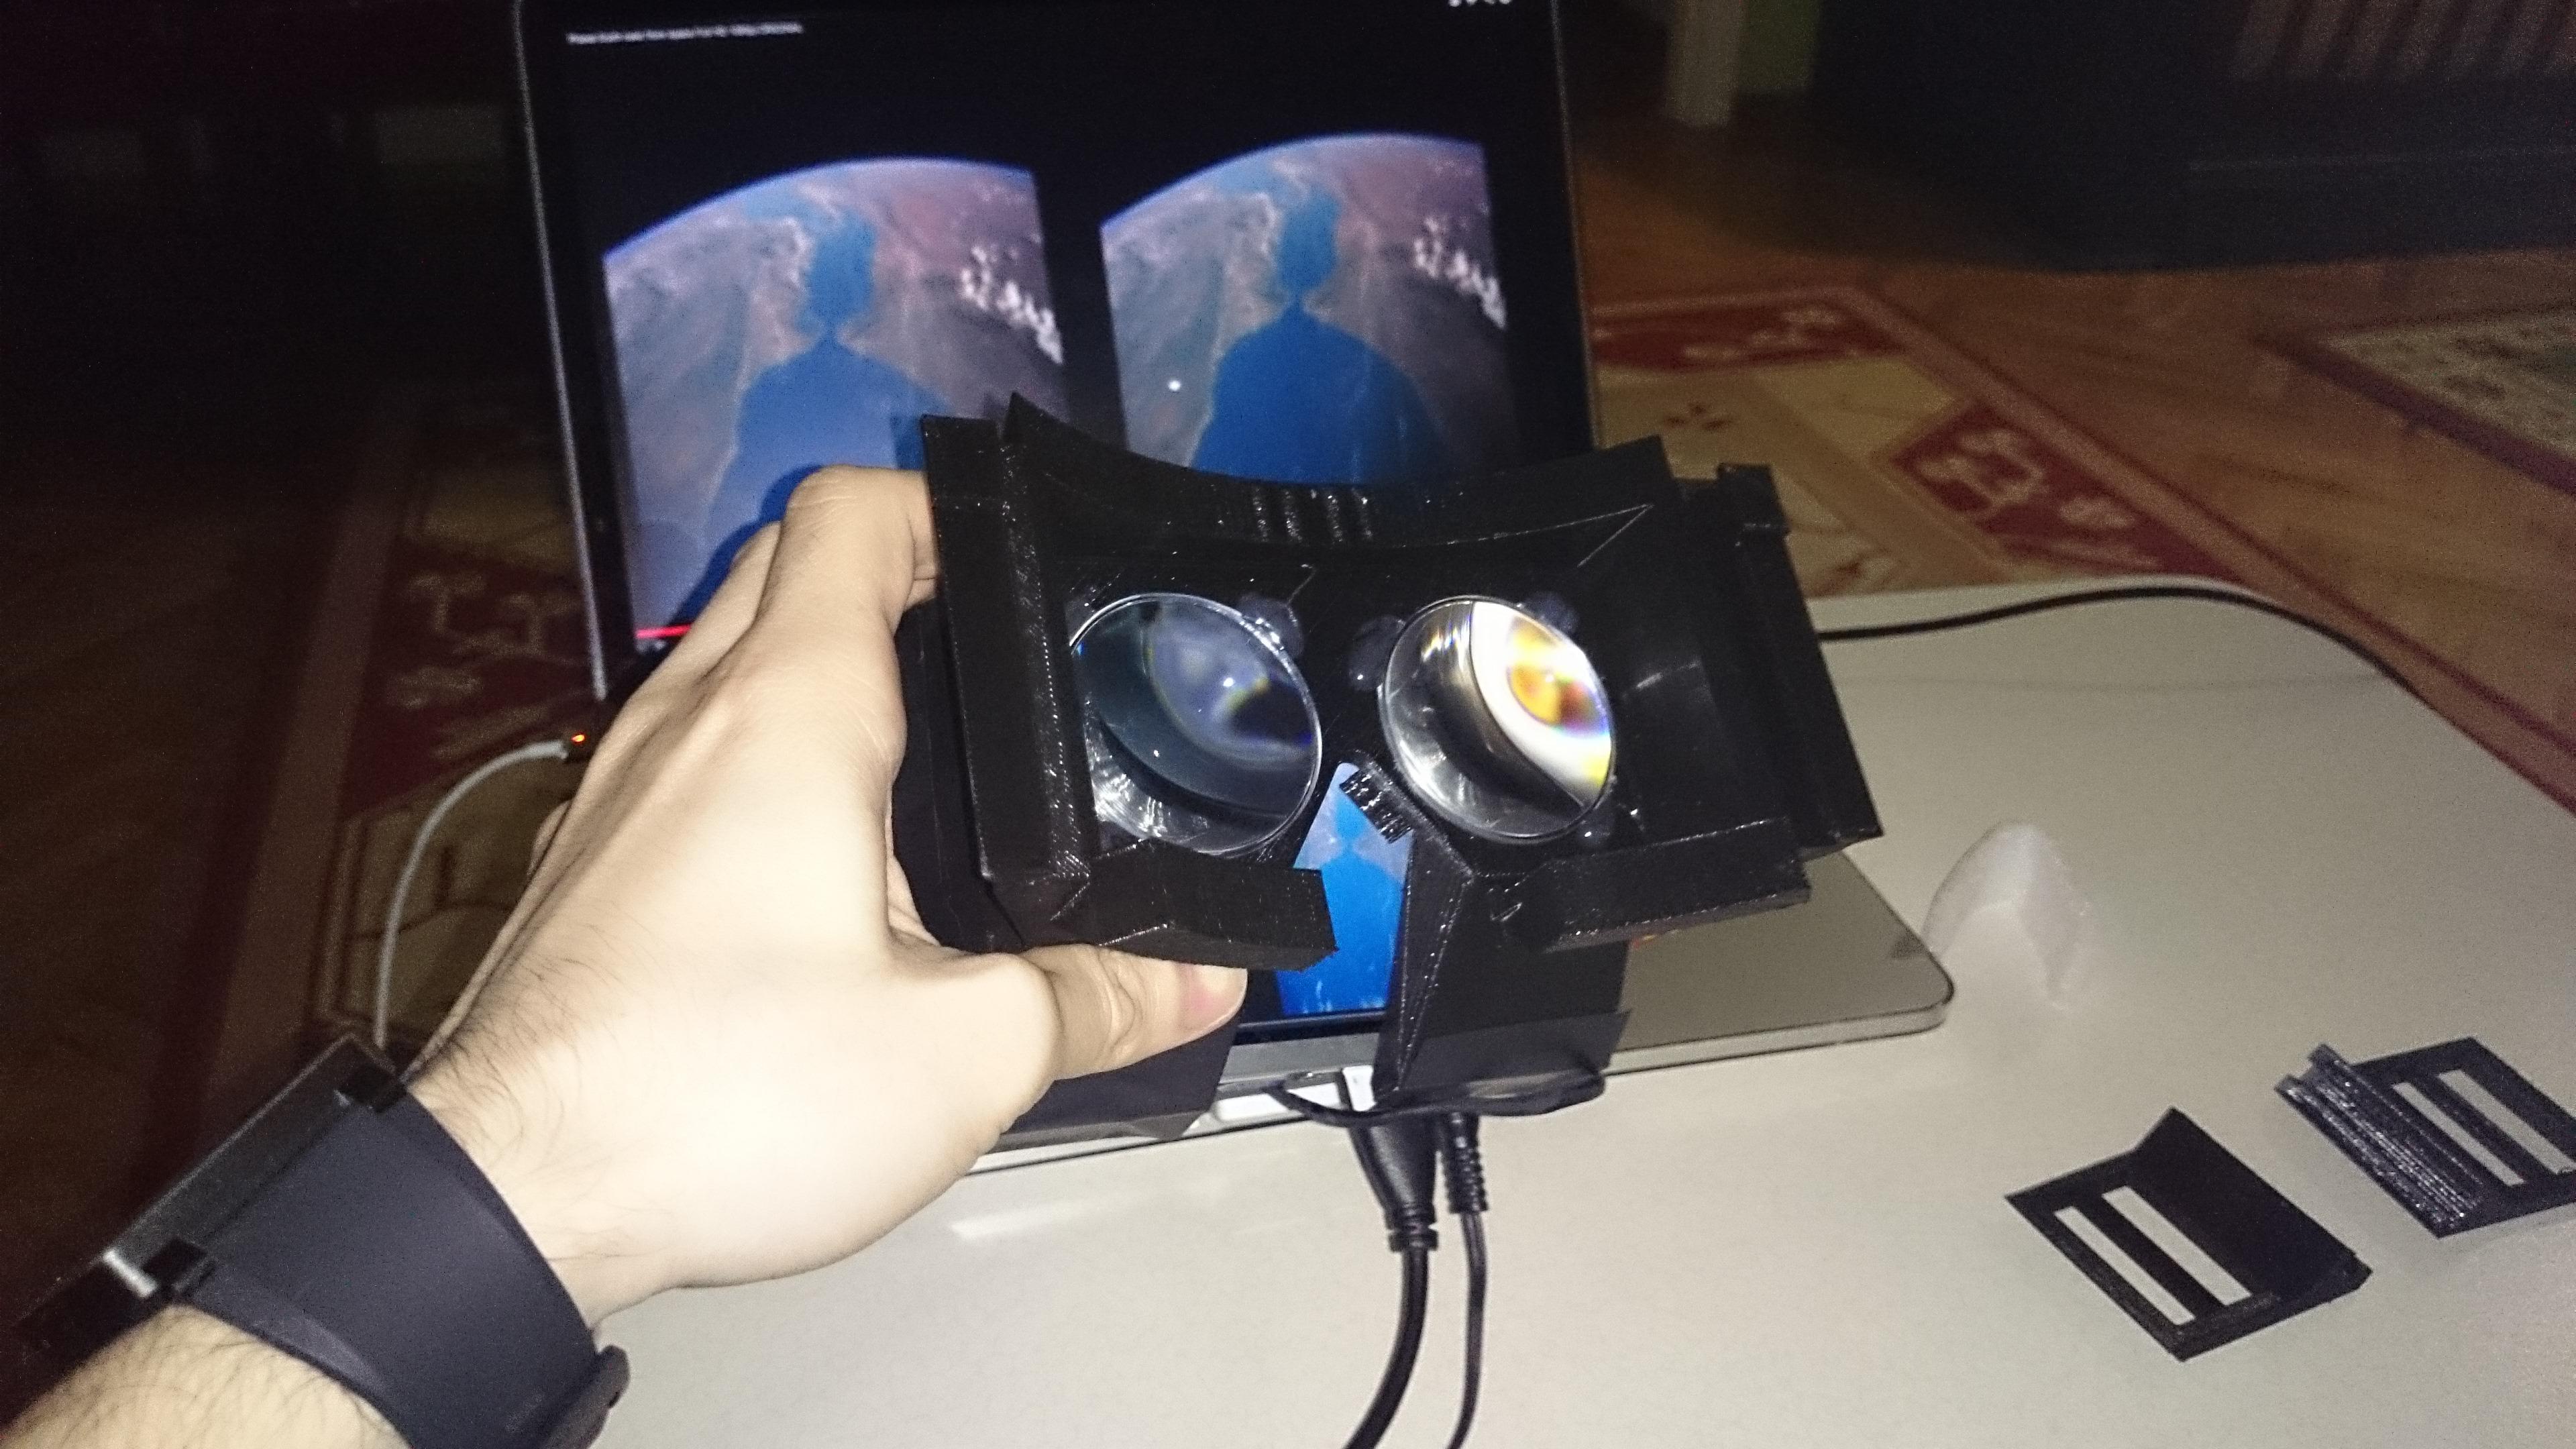 OpenVR: Building An Oculus Rift For Only $150 | Hackaday